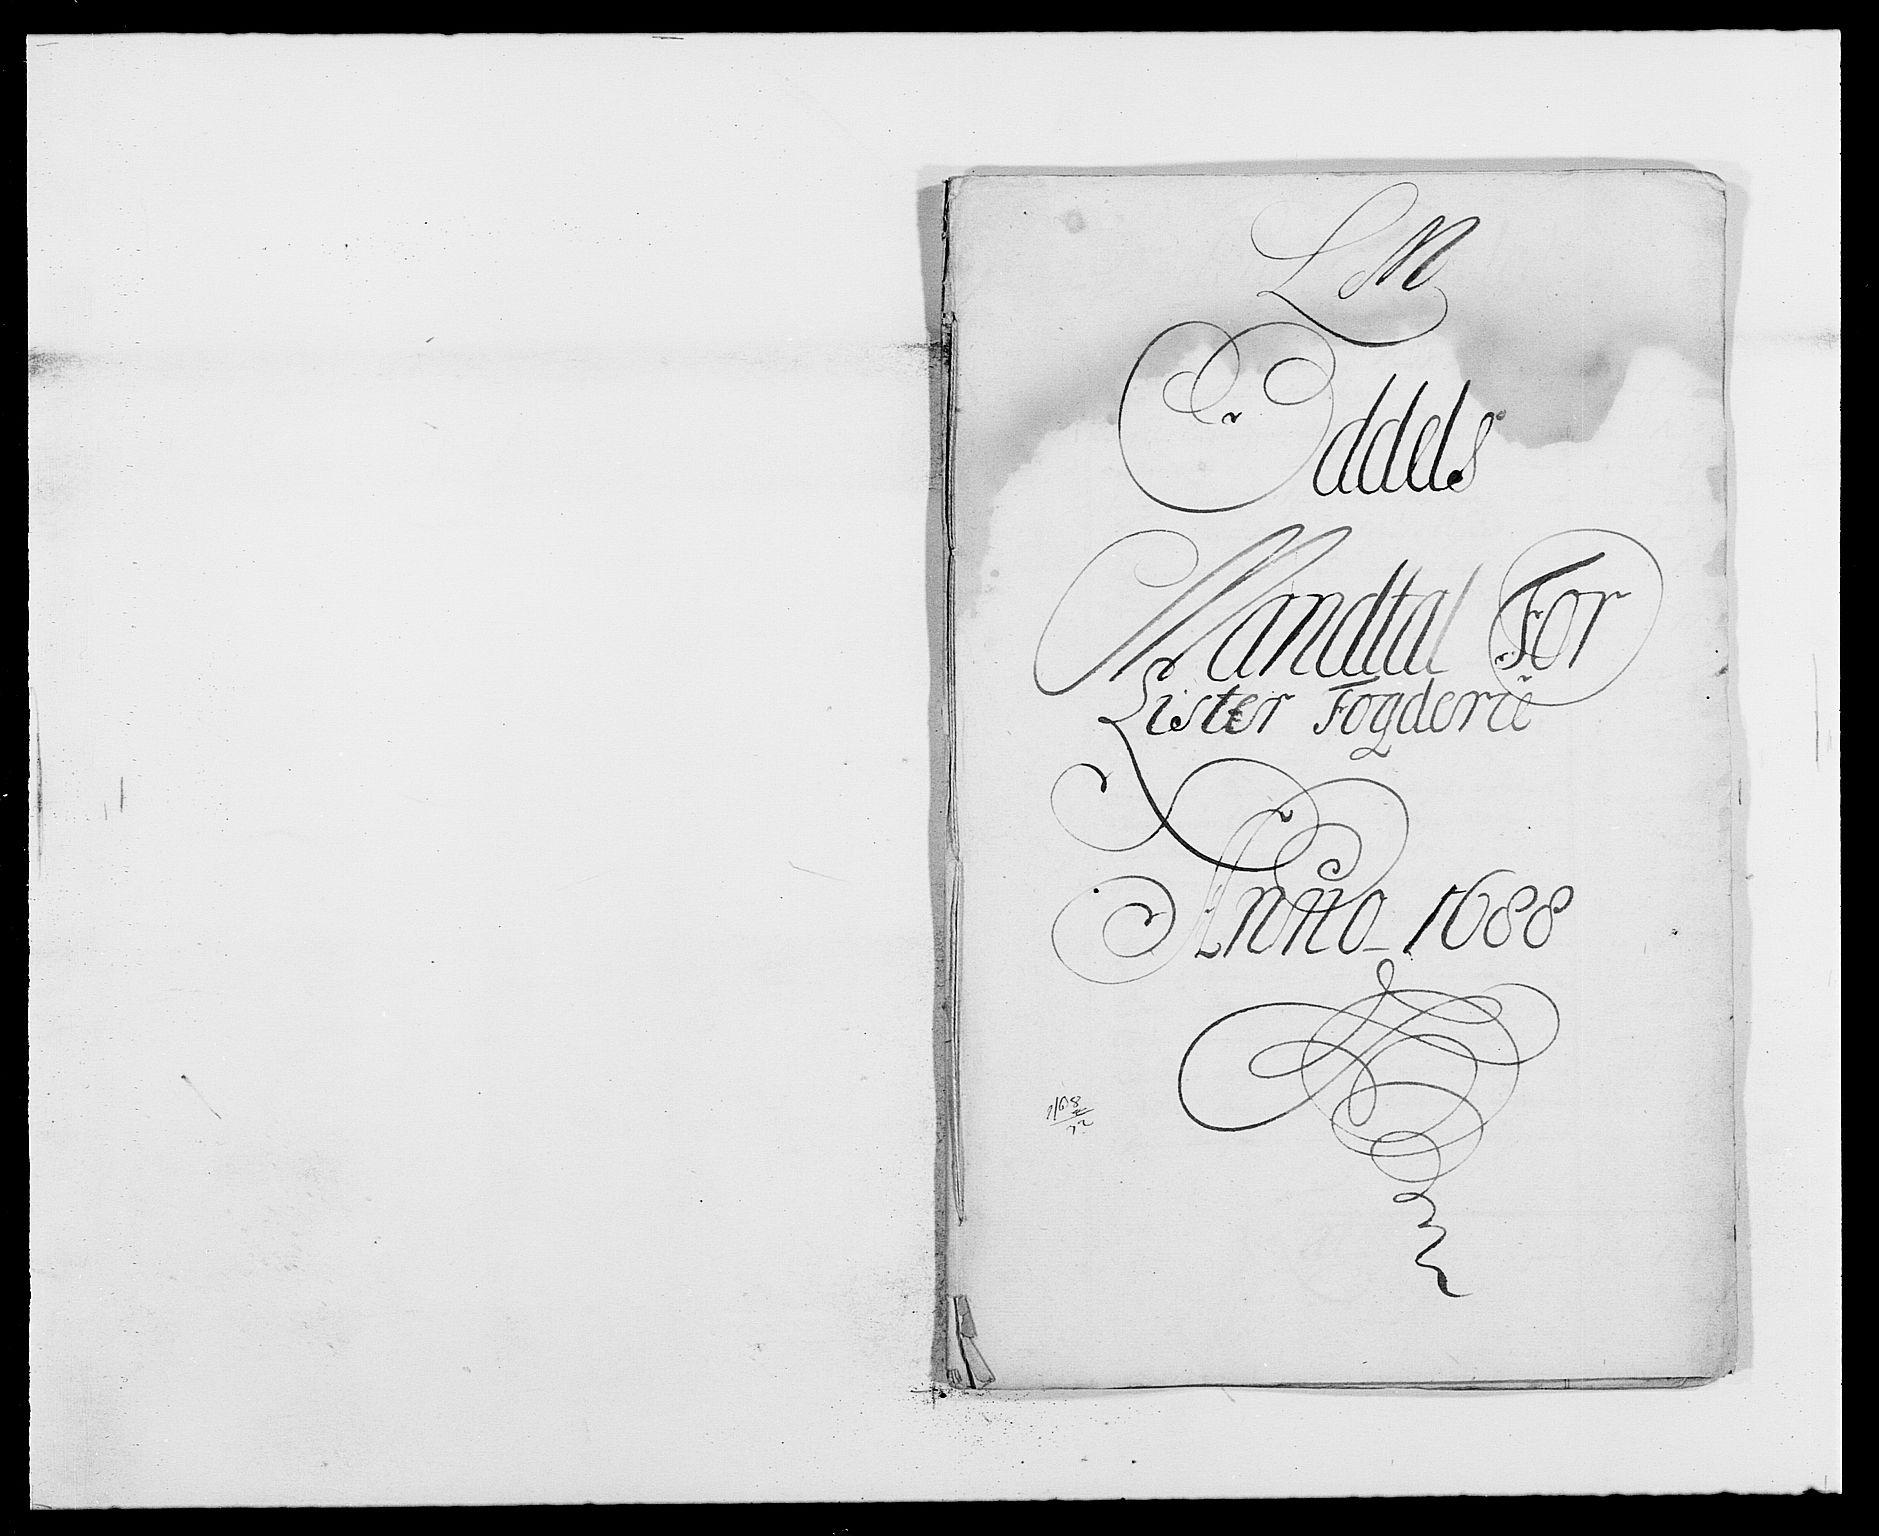 RA, Rentekammeret inntil 1814, Reviderte regnskaper, Fogderegnskap, R41/L2534: Fogderegnskap Lista, 1686-1688, s. 217